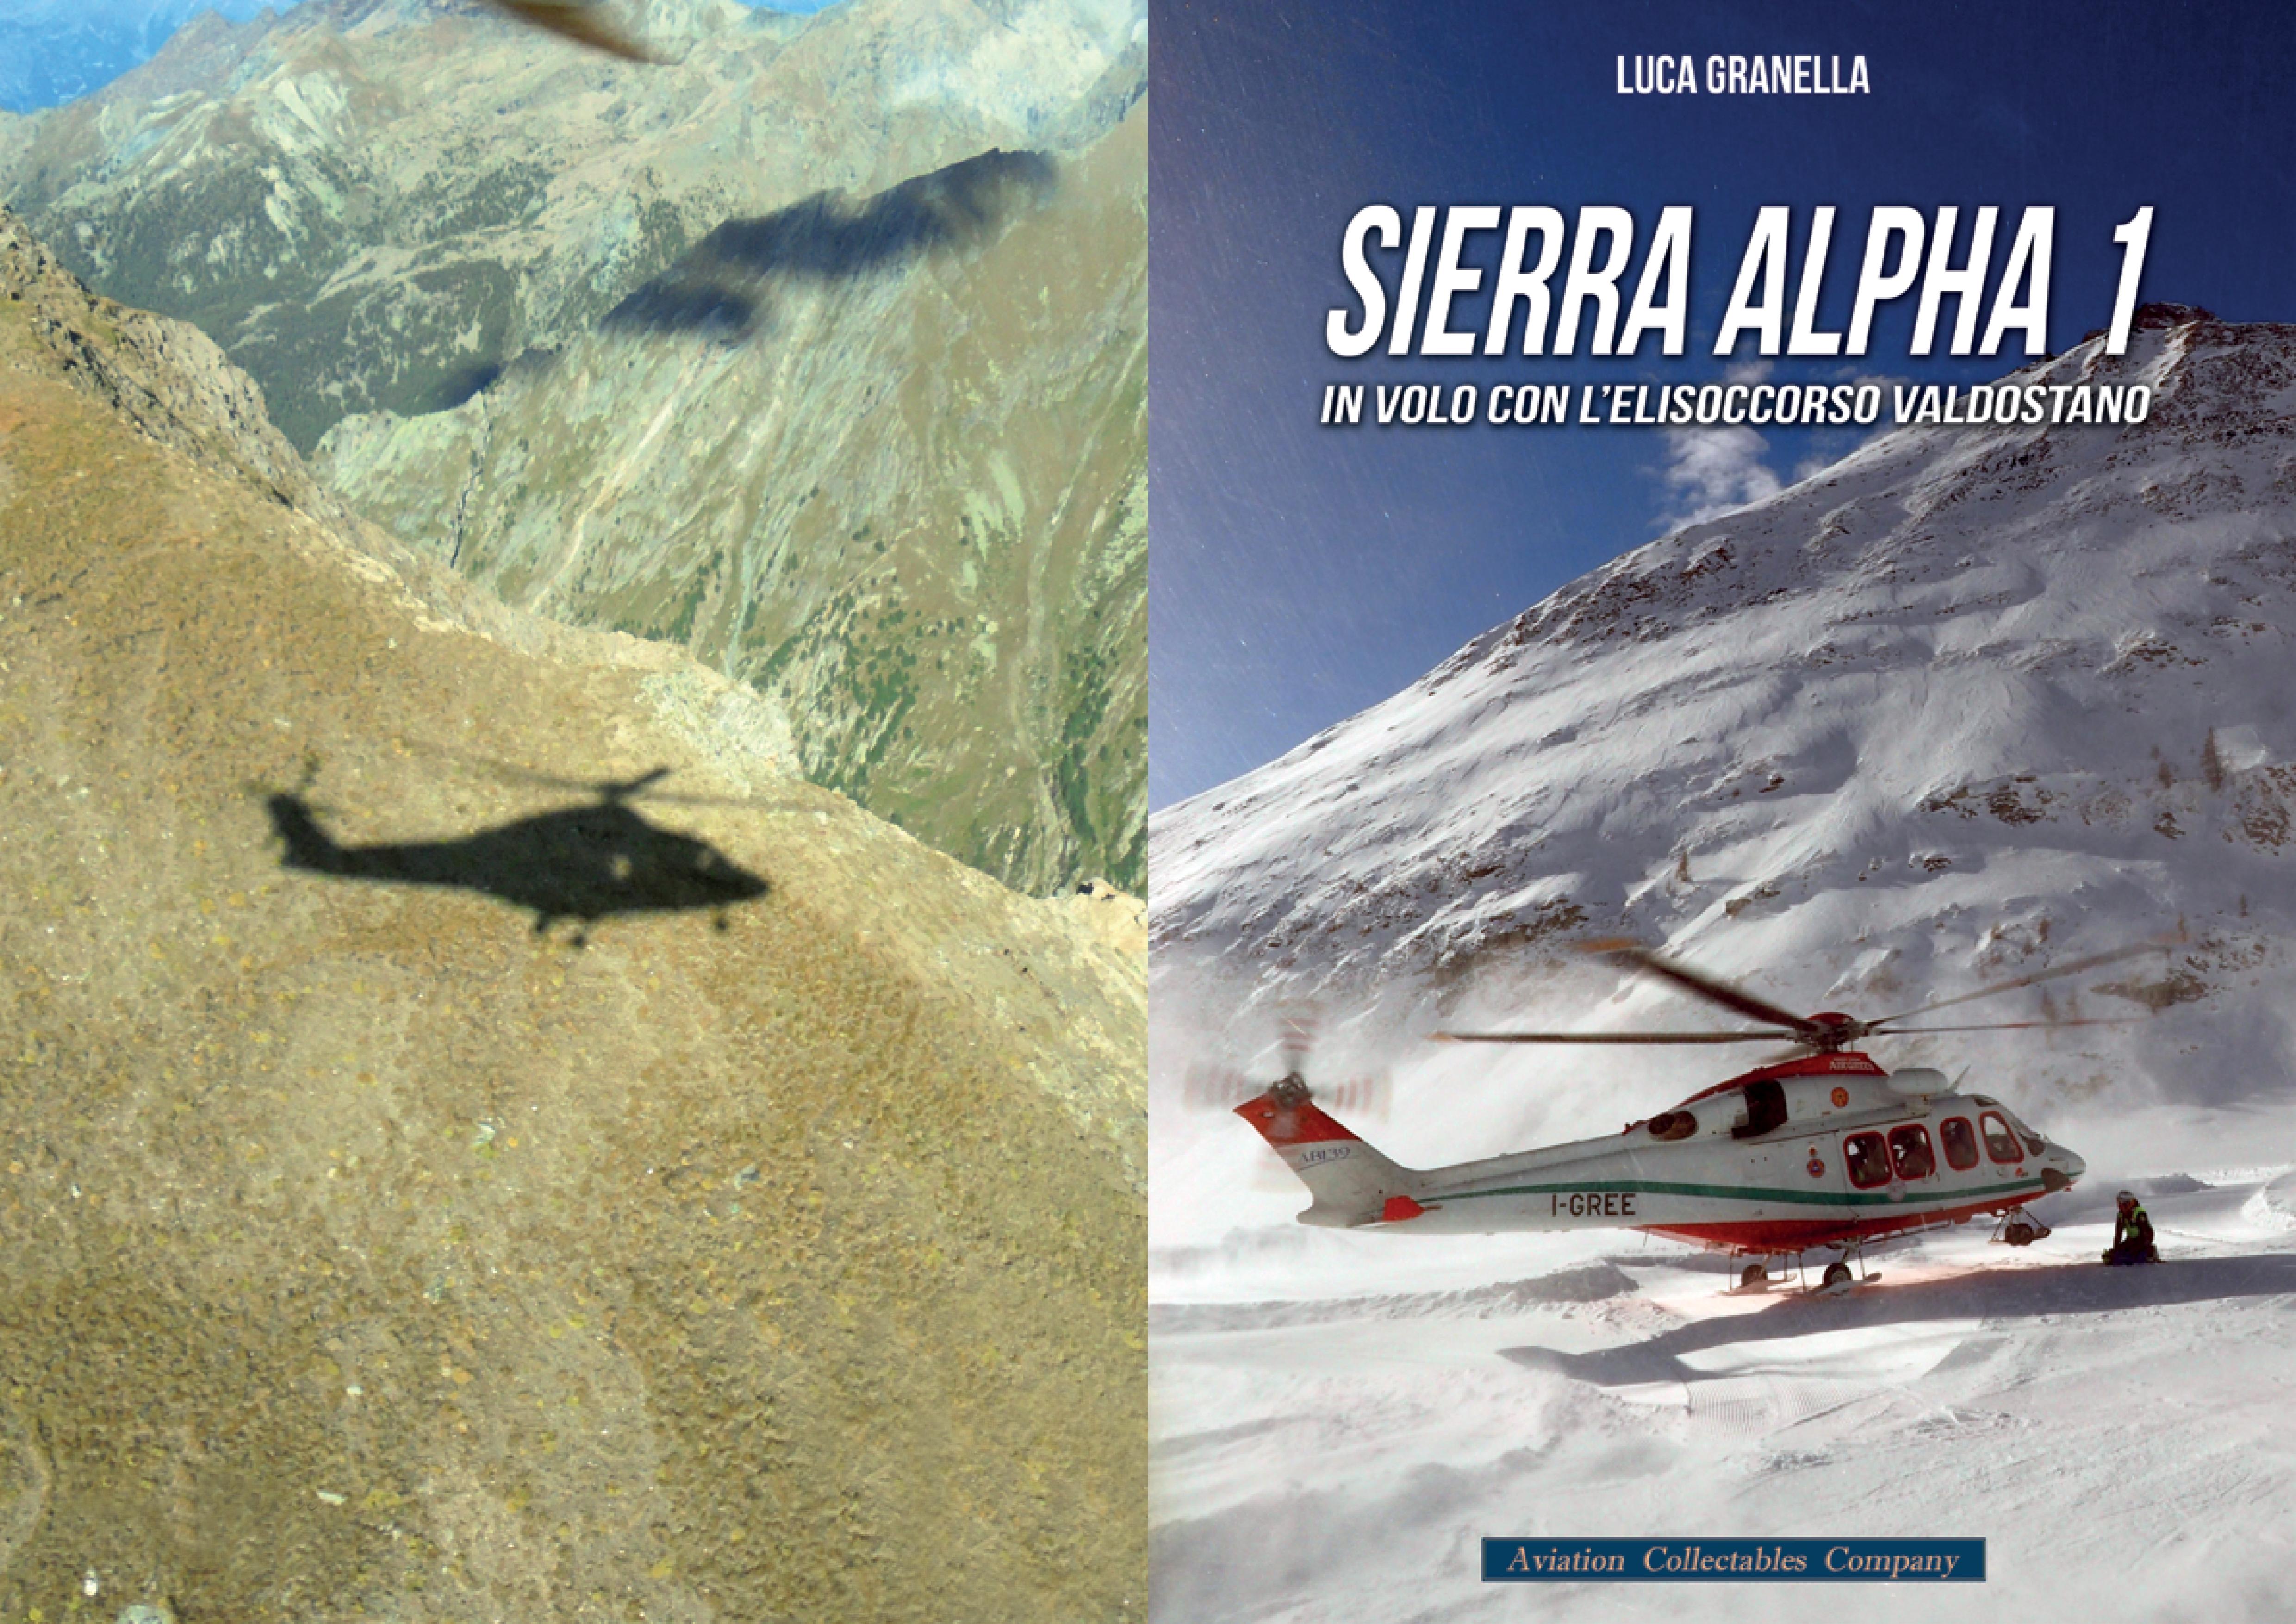 SIERRA ALFA 1 COVER 19 11 17-1